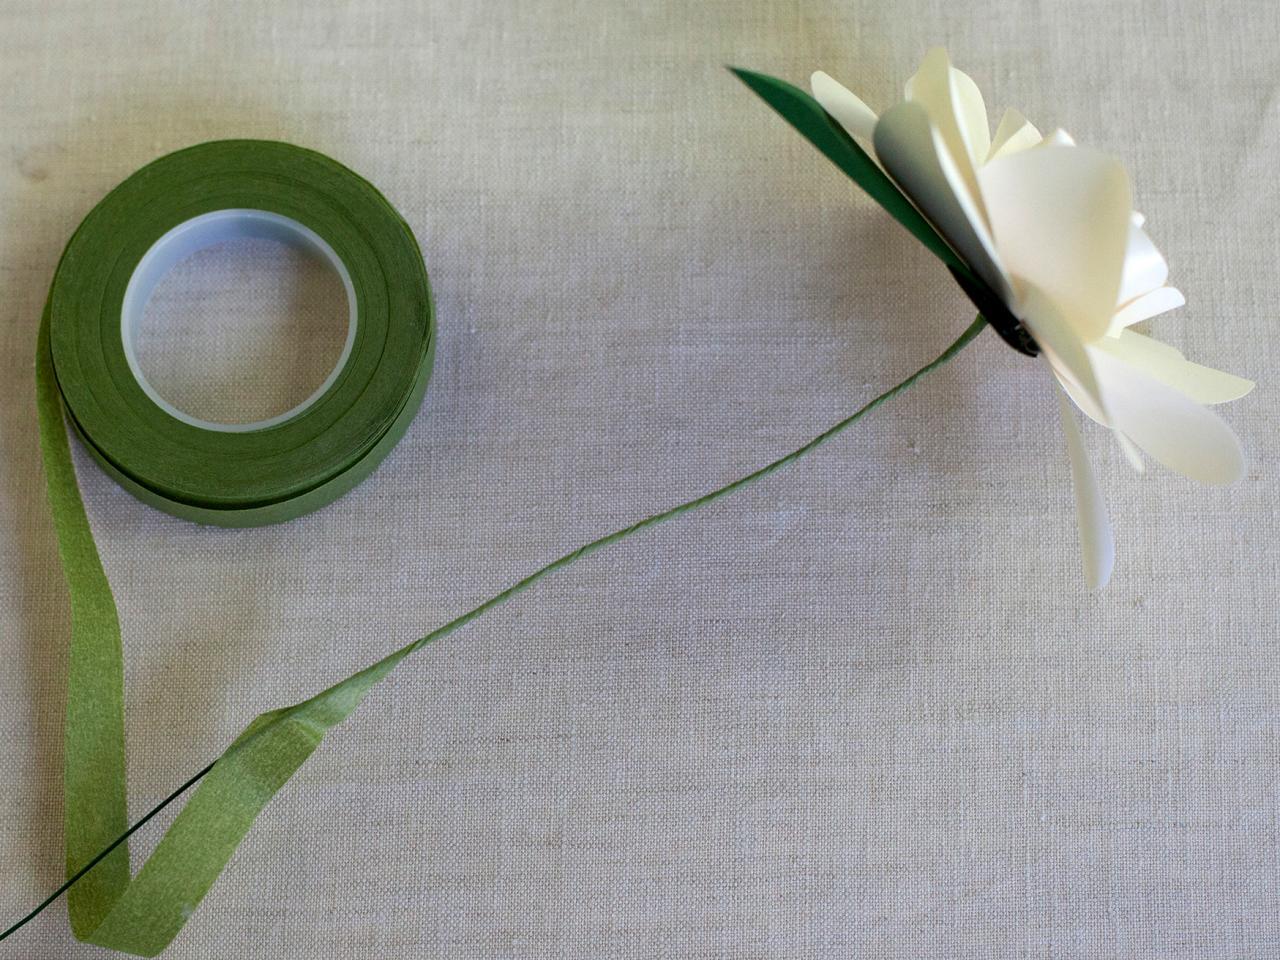 How to make paper gardenias how tos diy step 19 mightylinksfo